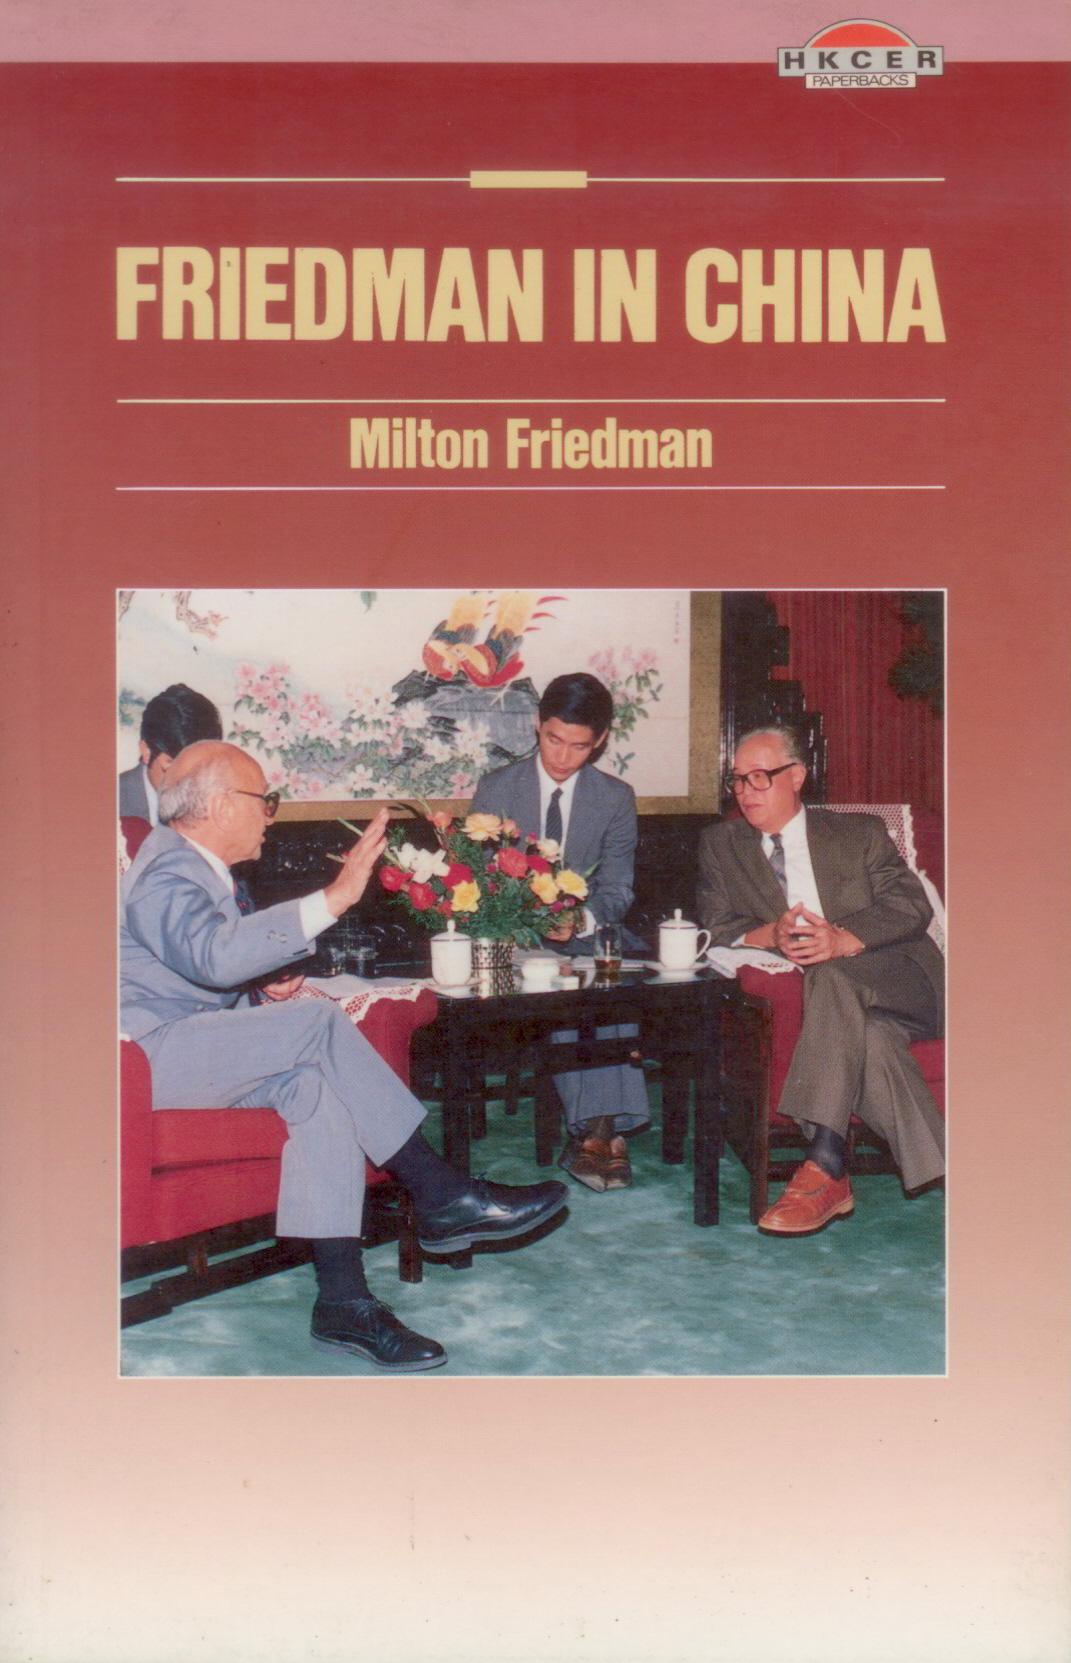 Friedman in China